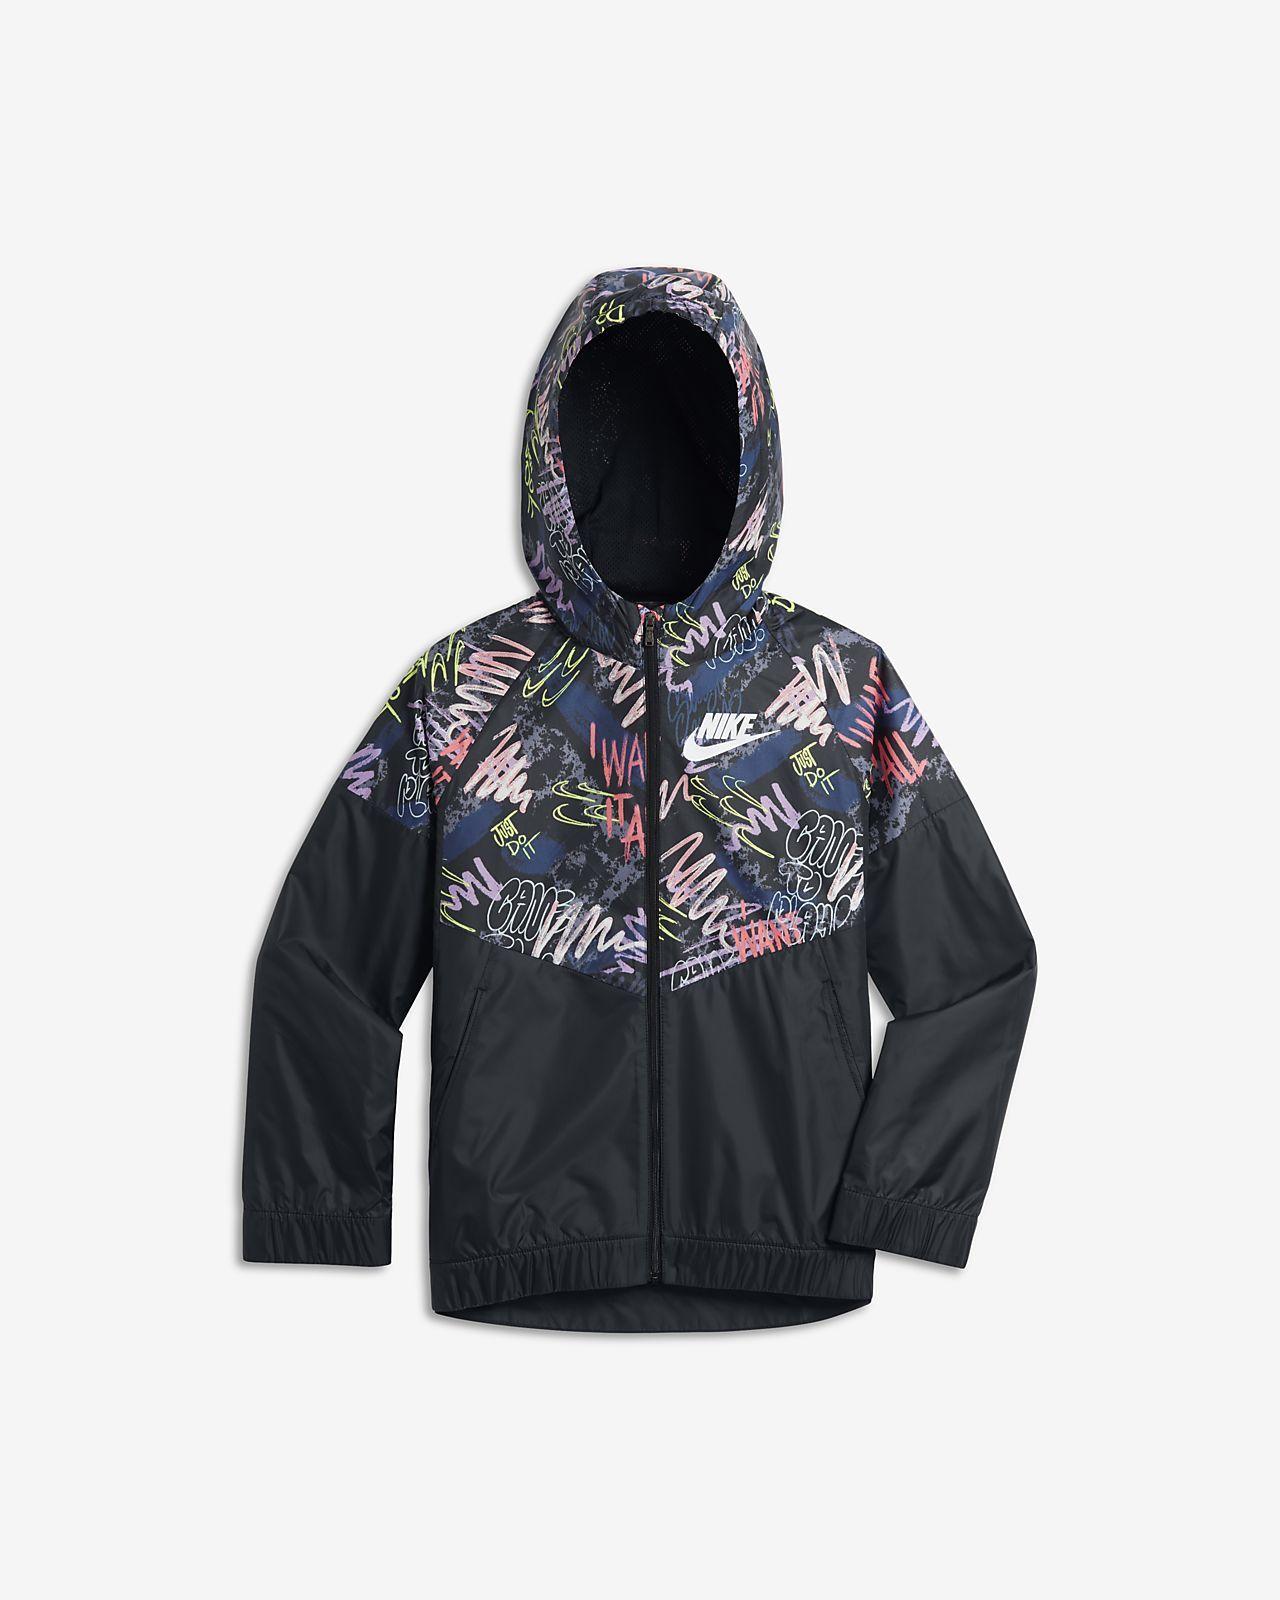 1d7fcedc4079 Nike Sportswear Windrunner Big Kids  (Girls ) Printed Jacket